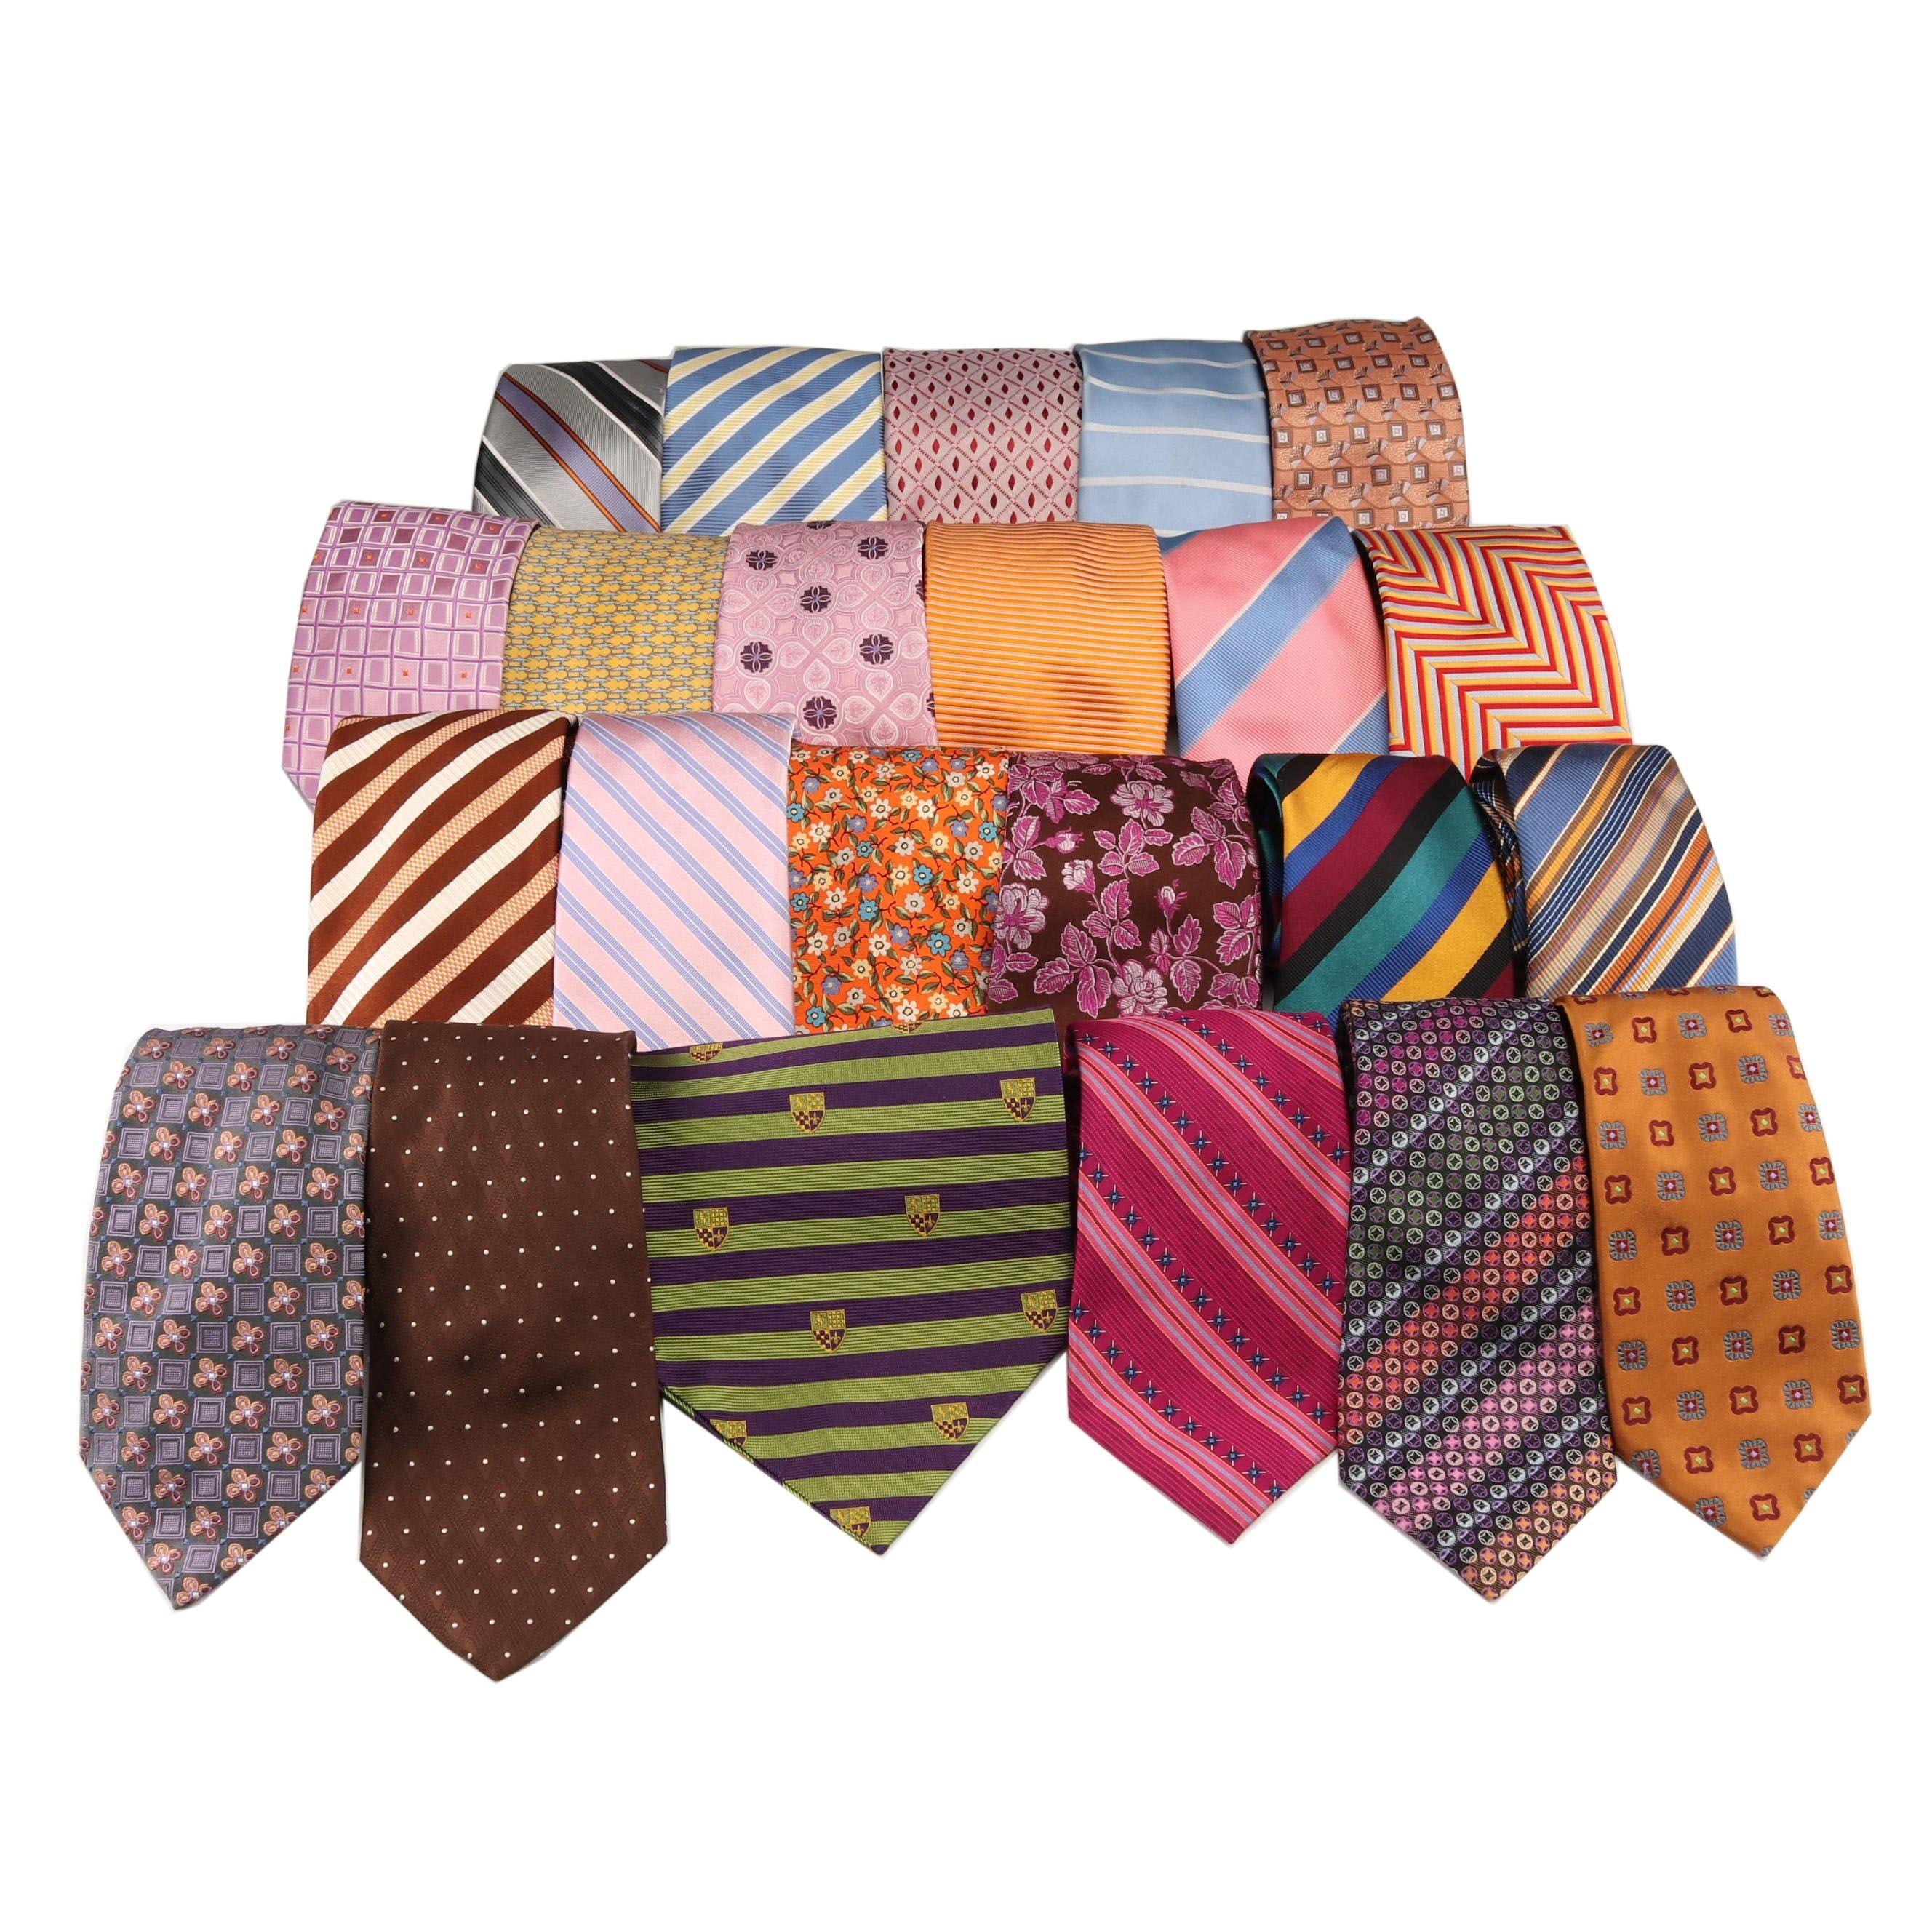 Men's Silk Neckties Including Giorgio Armani, Robert Talbott, and Paul Smith